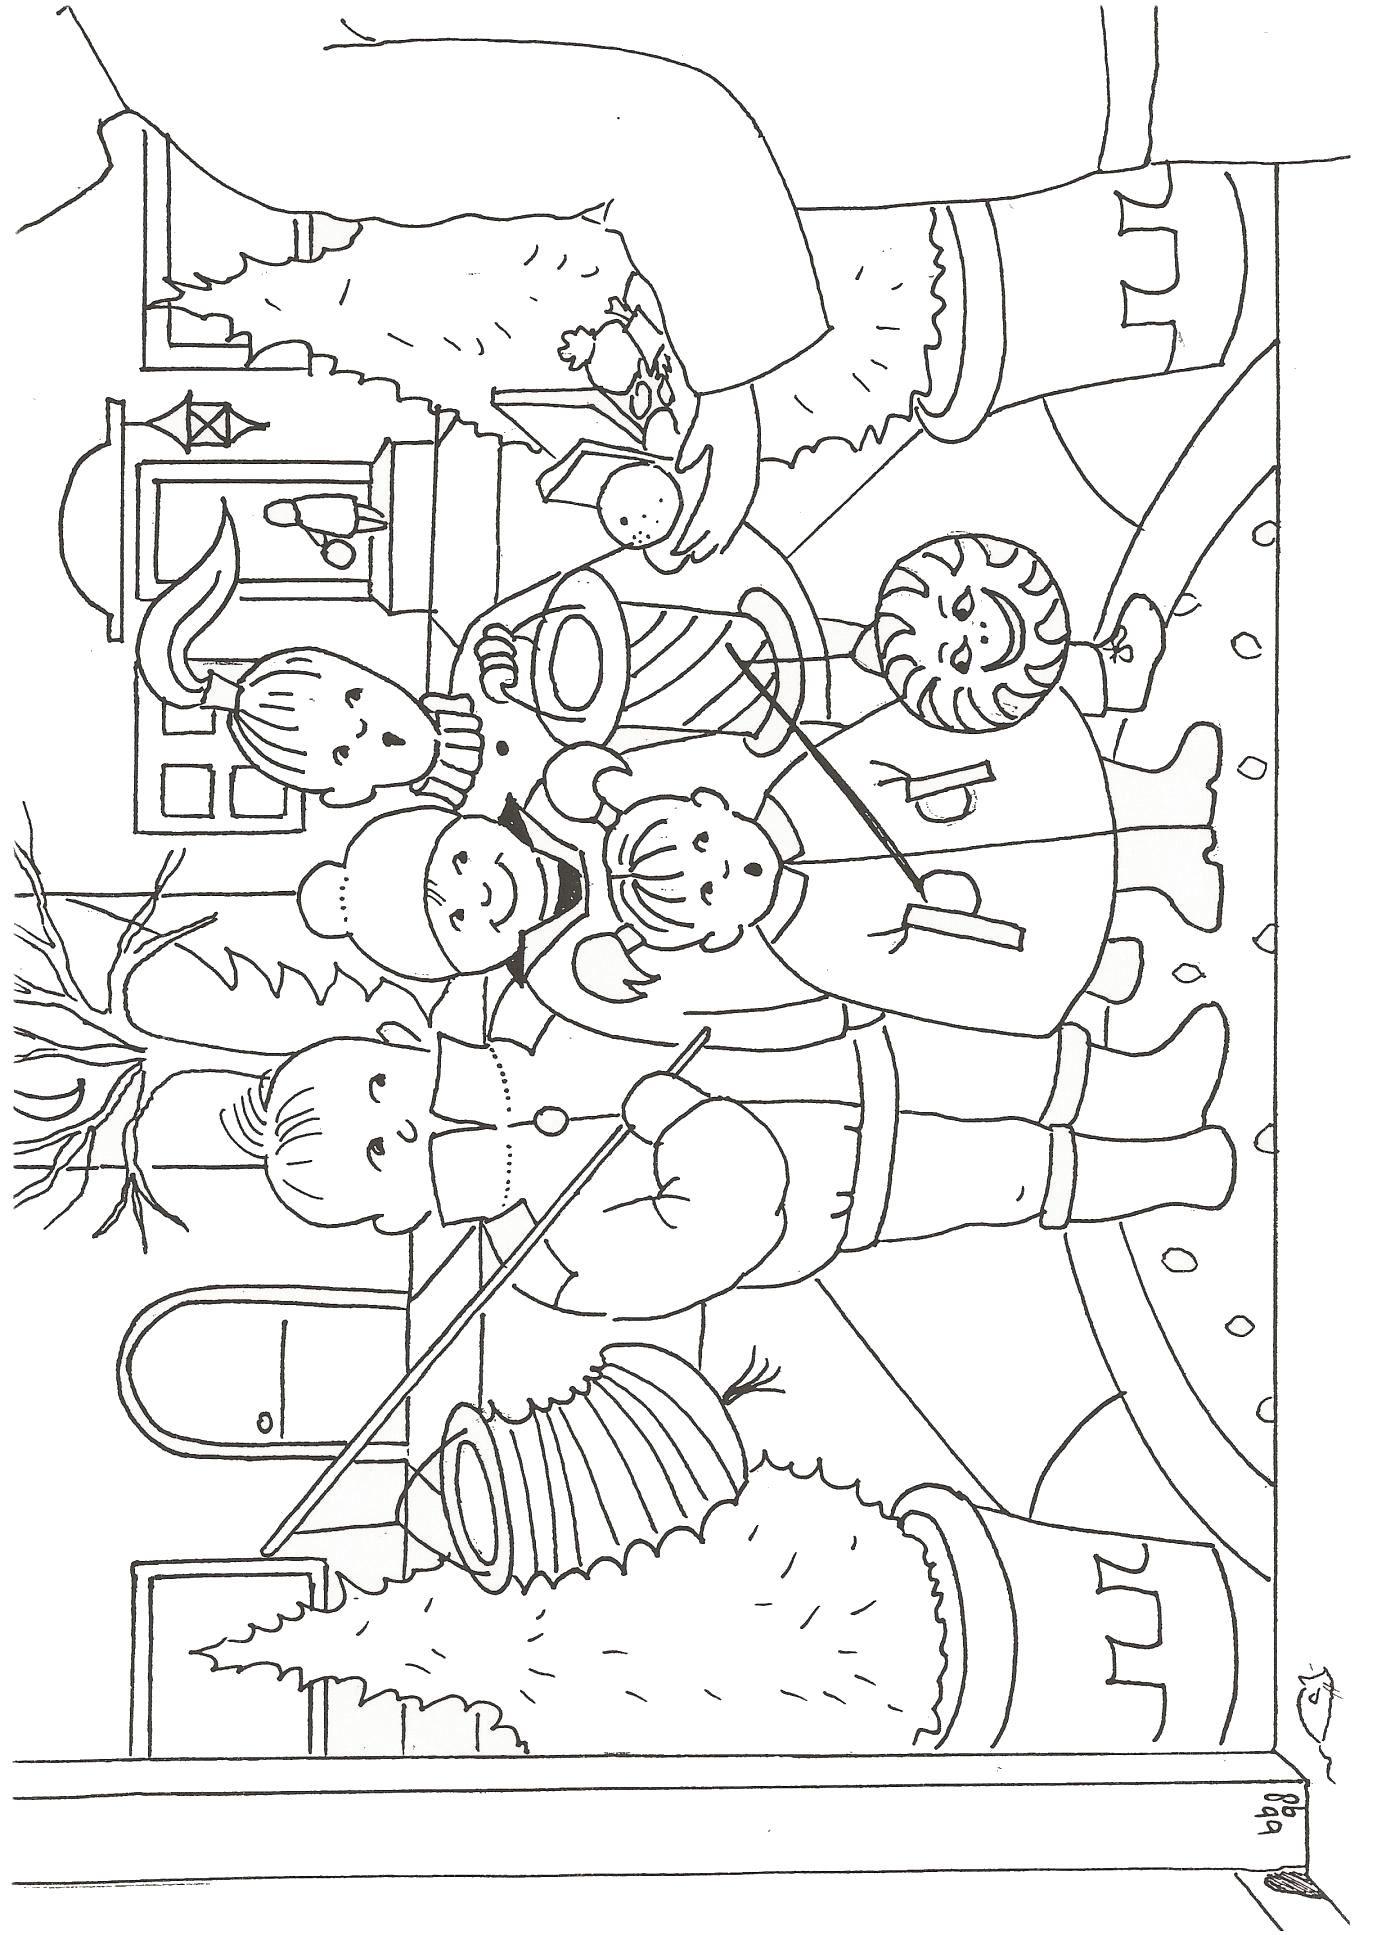 Ausmalbild Laterne - kinderbilderdownload kinderbilder